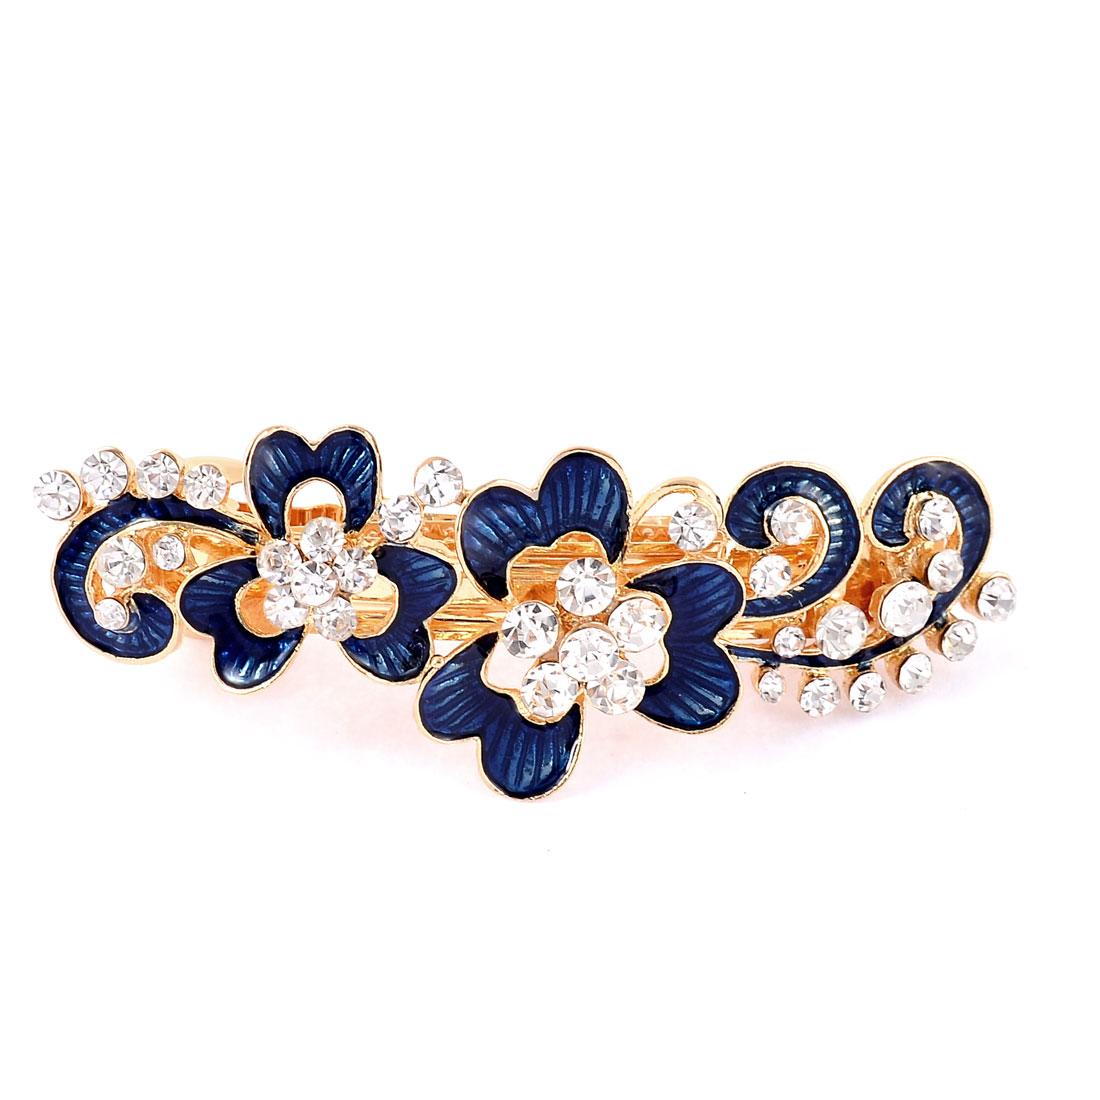 Lady Head Wear Faux Crystal Inlaid Floral Design Hair Barrette Clip Hairpin Blue